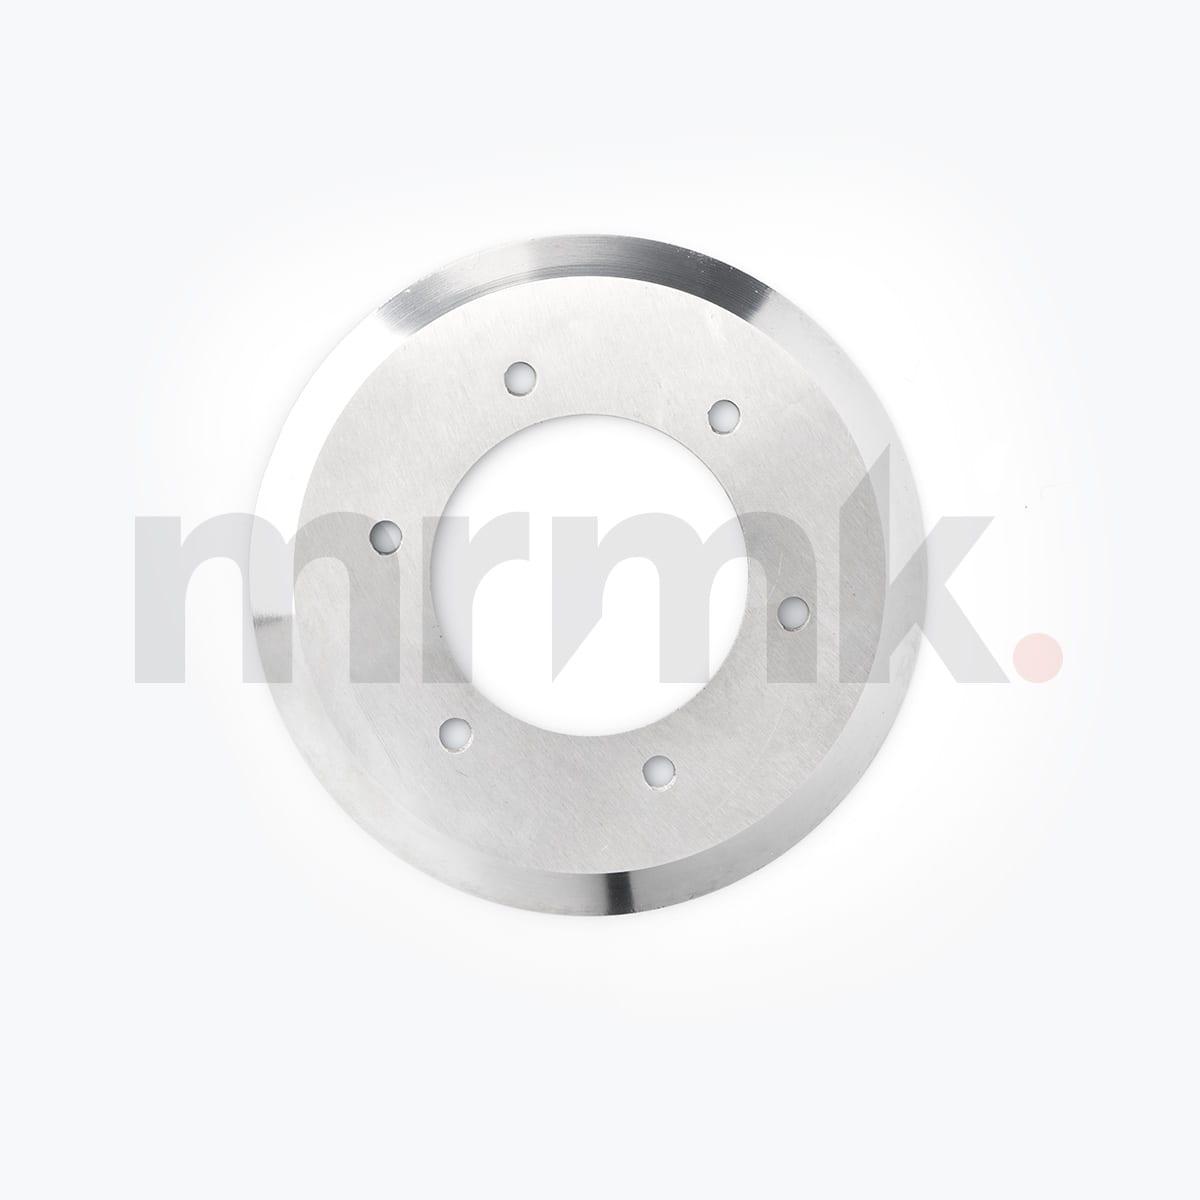 Multivac Circular Knife 2 White